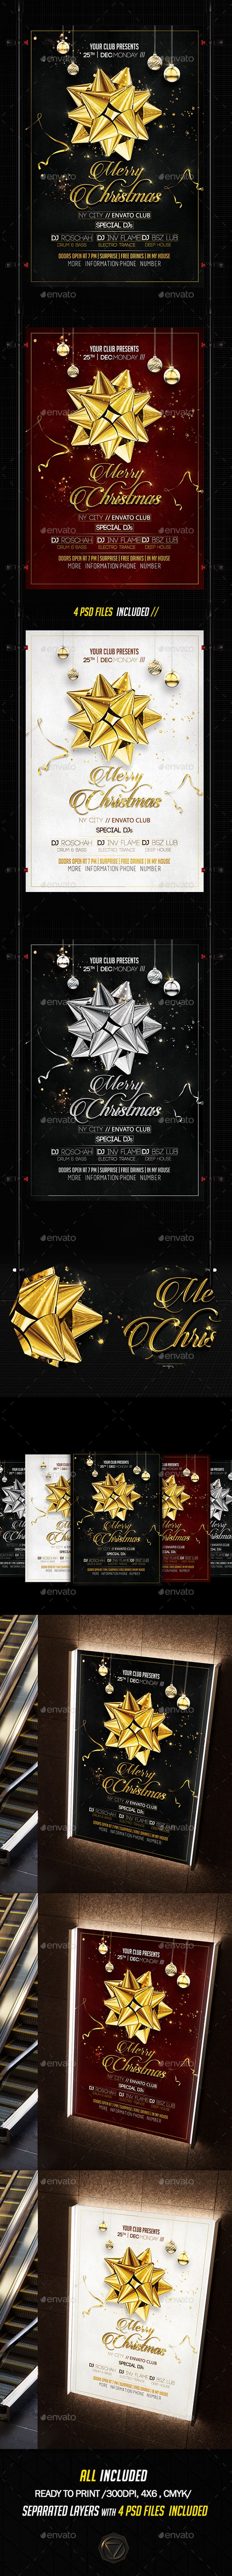 christmas flyer design template holidays events flyer design christmas flyer design template holidays events flyer design template psd here